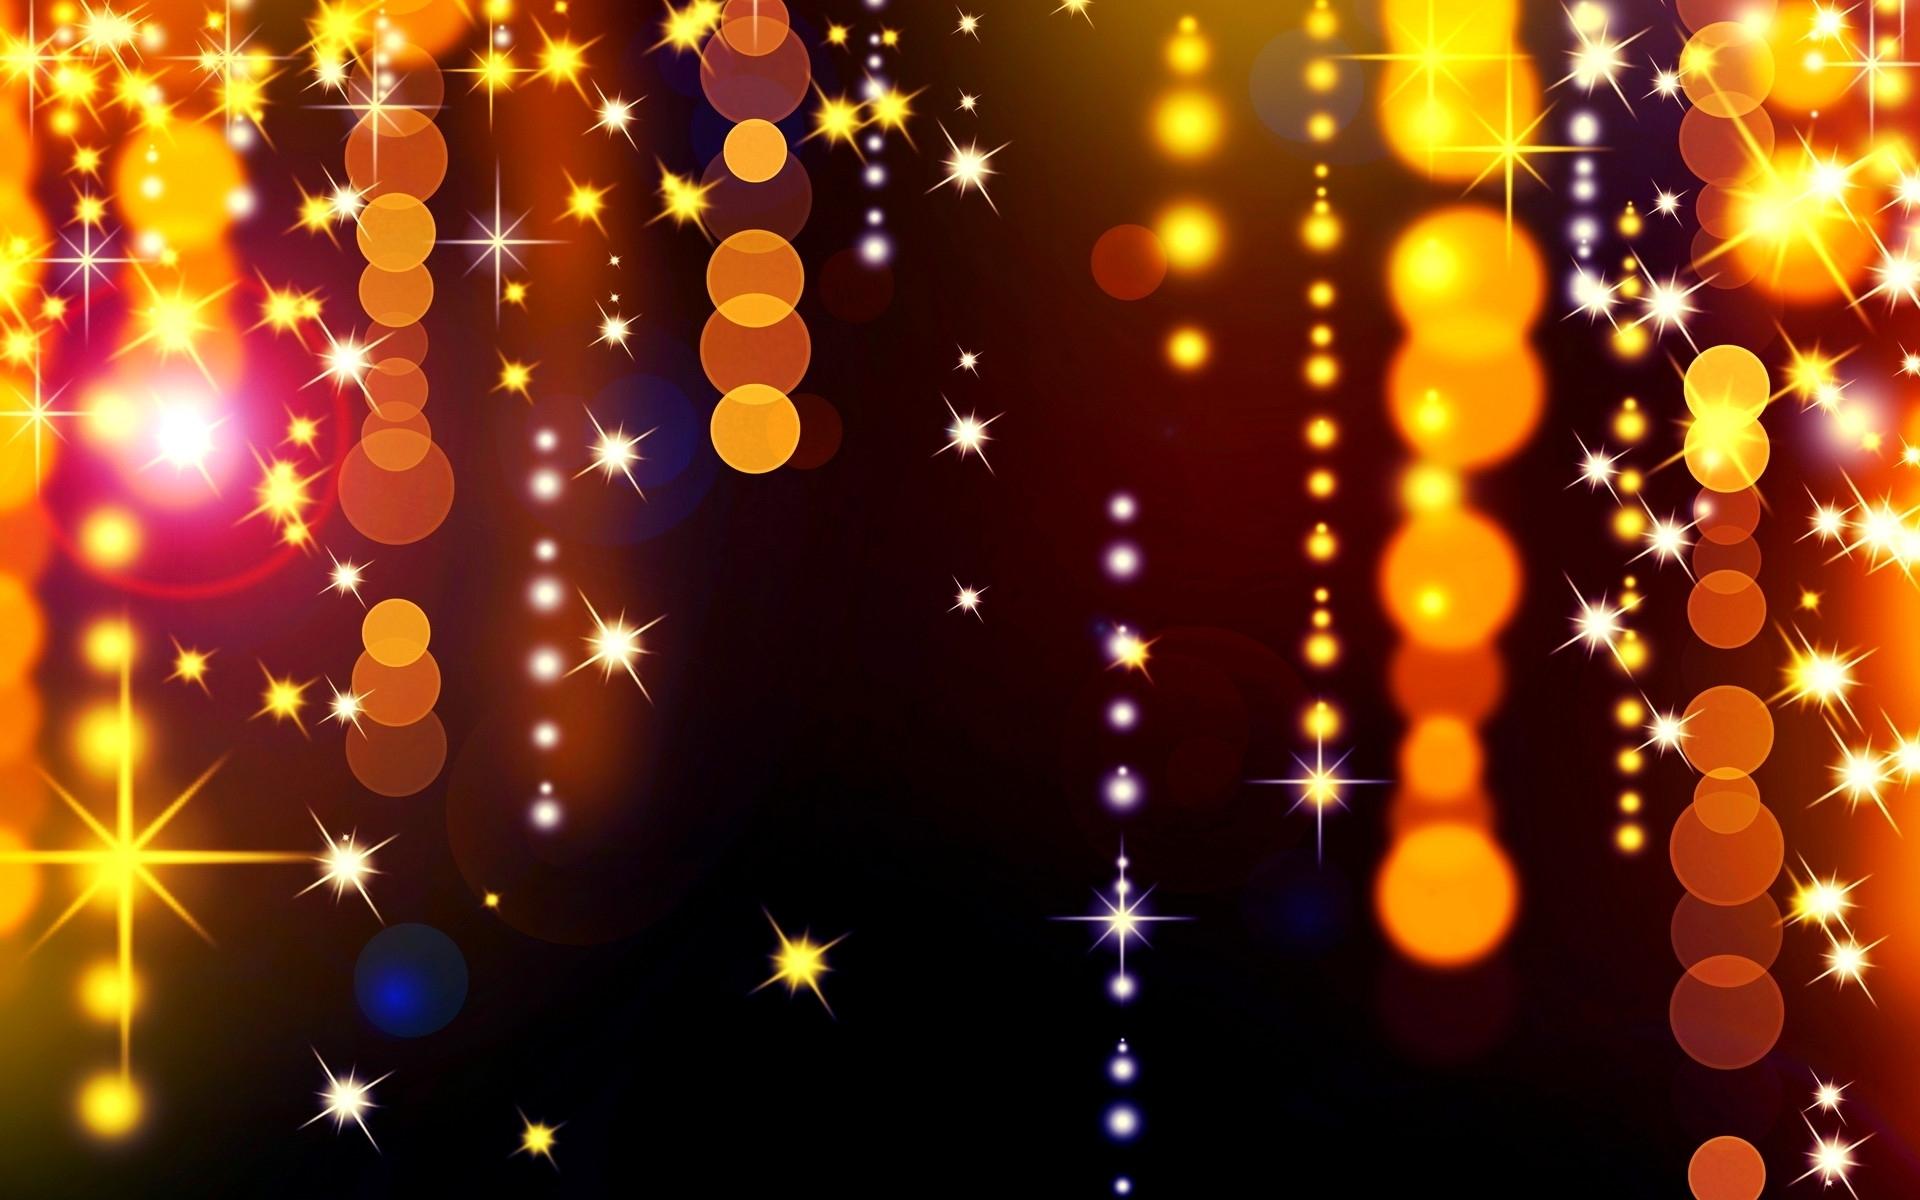 christmas lights wallpaper hd | pixelstalk